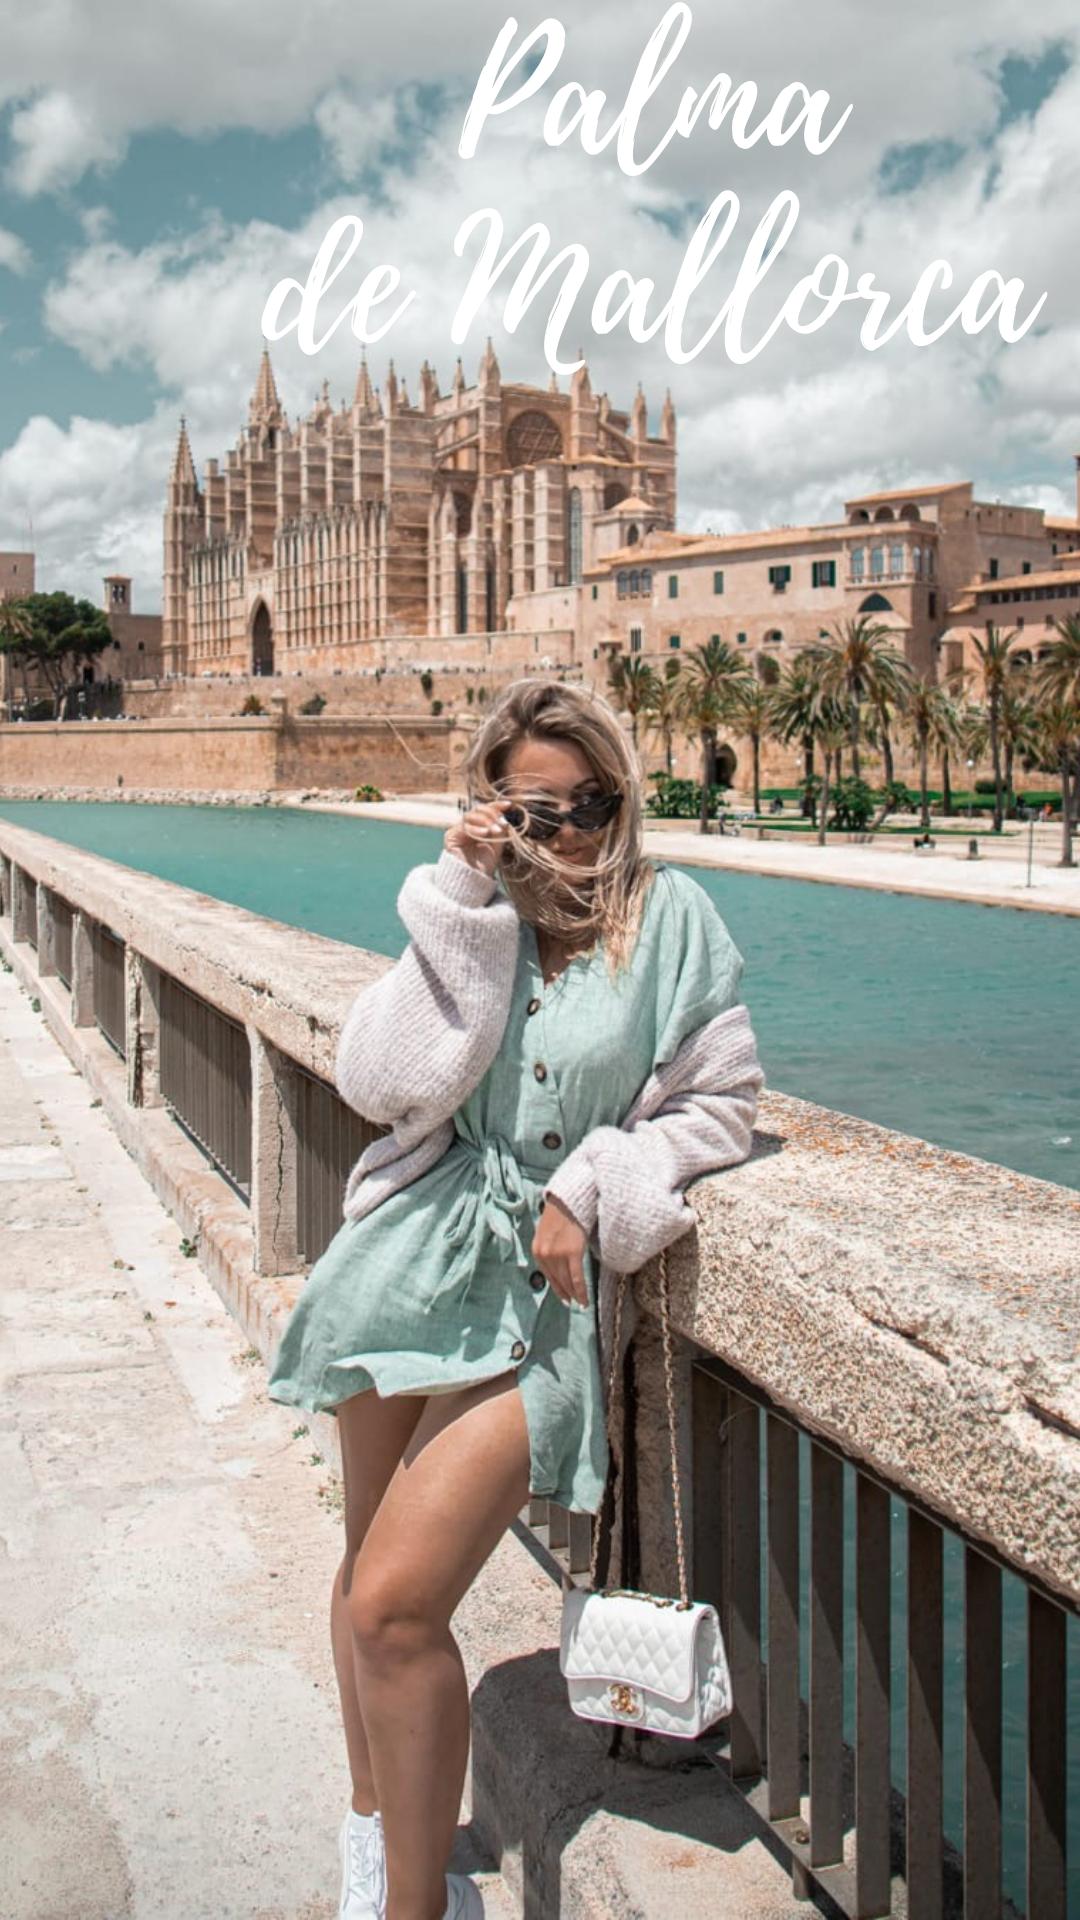 Tagesausflug nach Palma de Mallorca